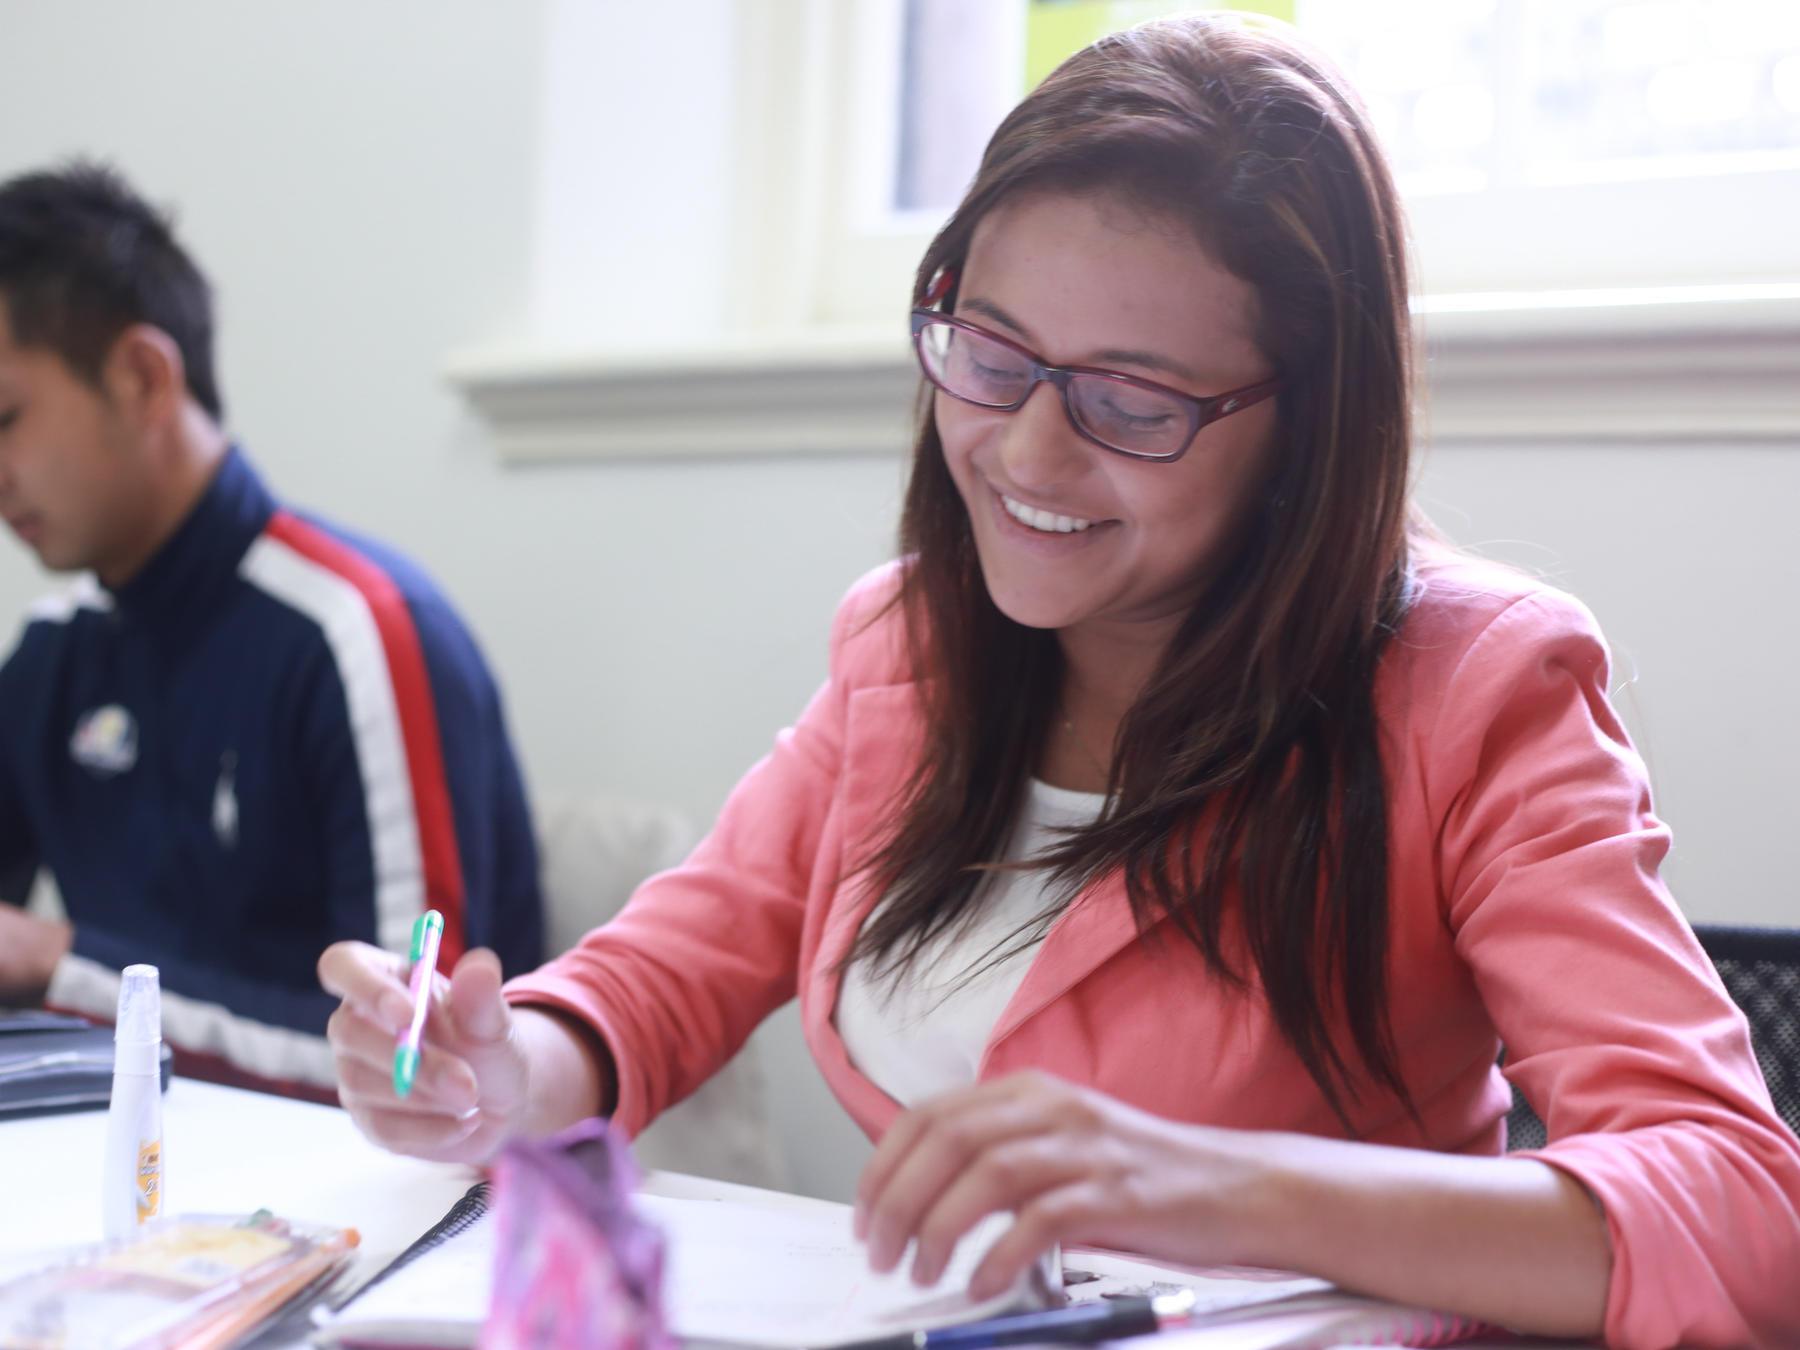 melbourne_school_classroom_students_03